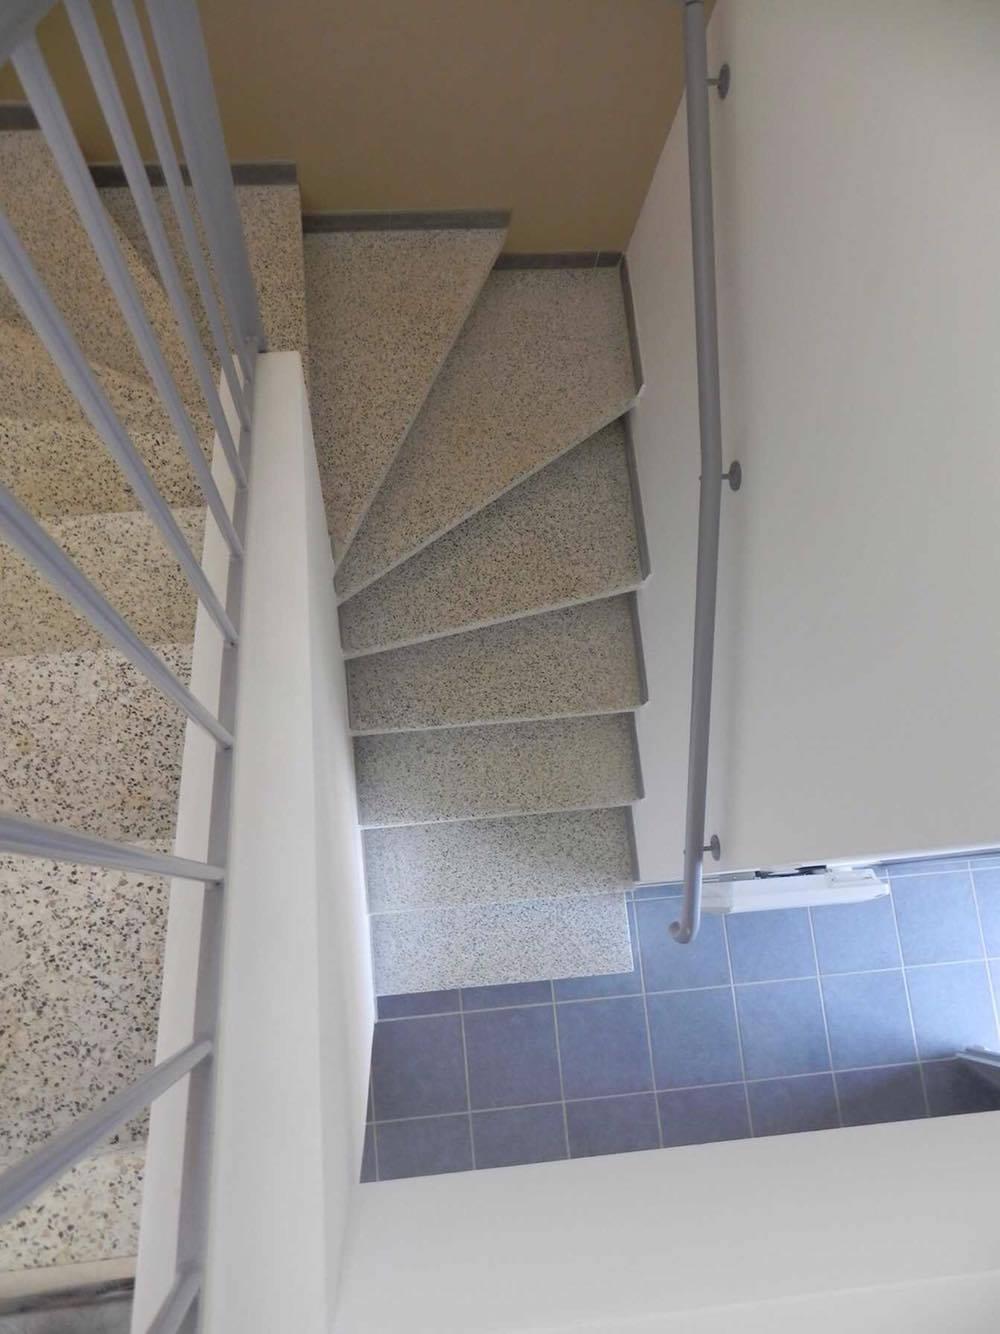 fabrication et pose d 39 escalier granito carcassonne et. Black Bedroom Furniture Sets. Home Design Ideas